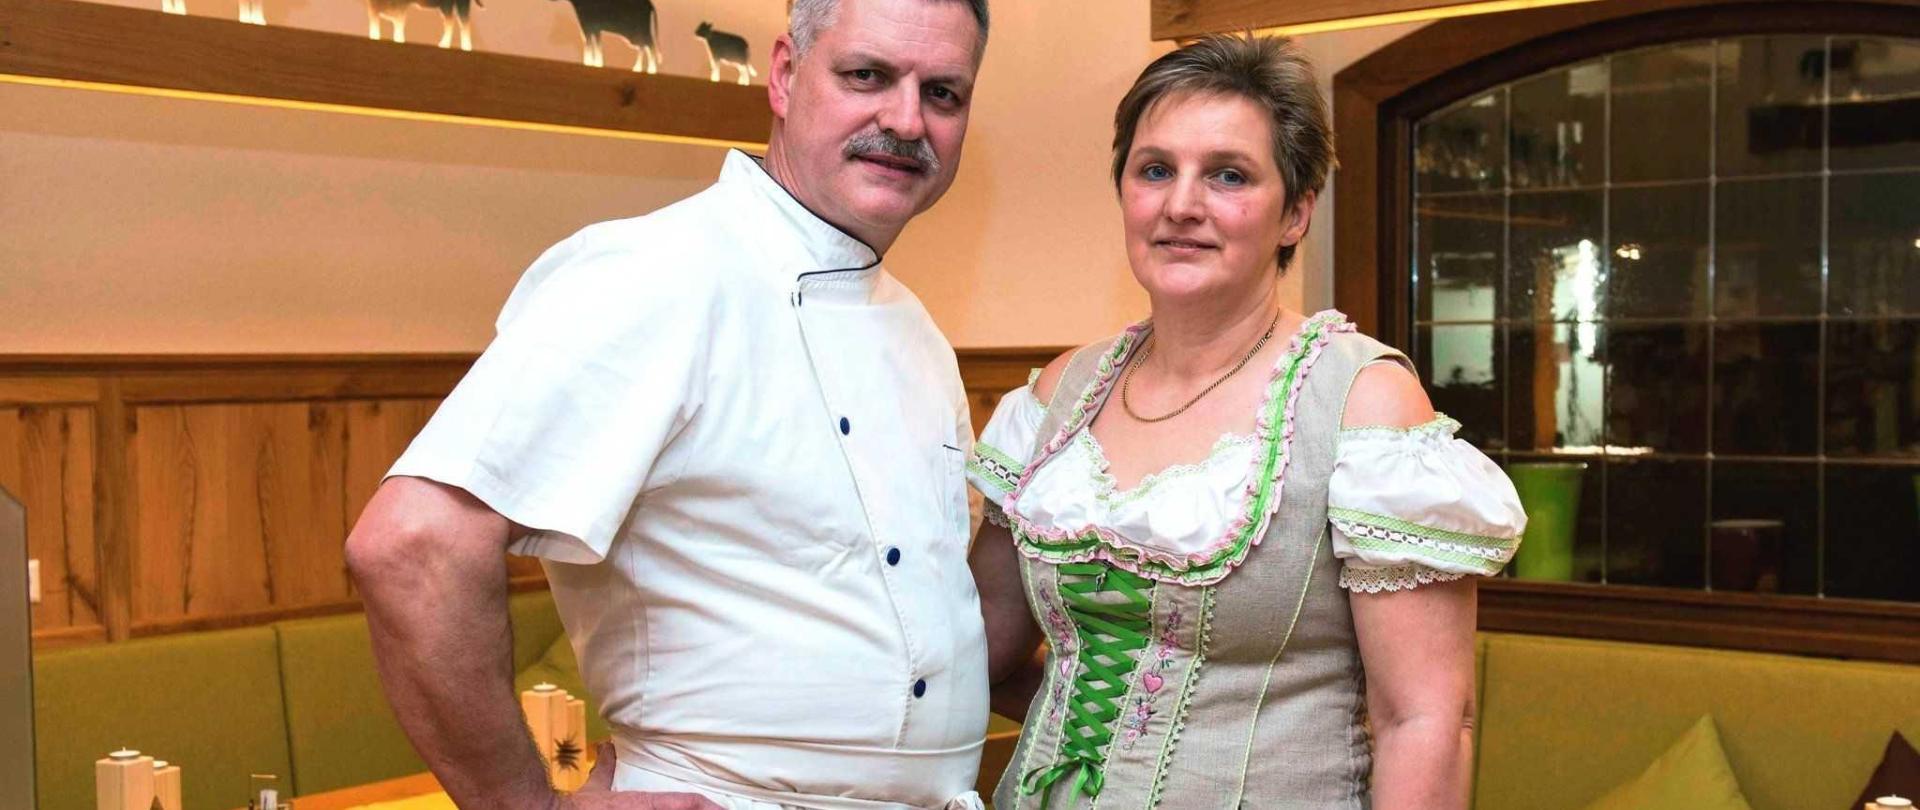 2016-12-05-umbau-restaurant-1.jpg